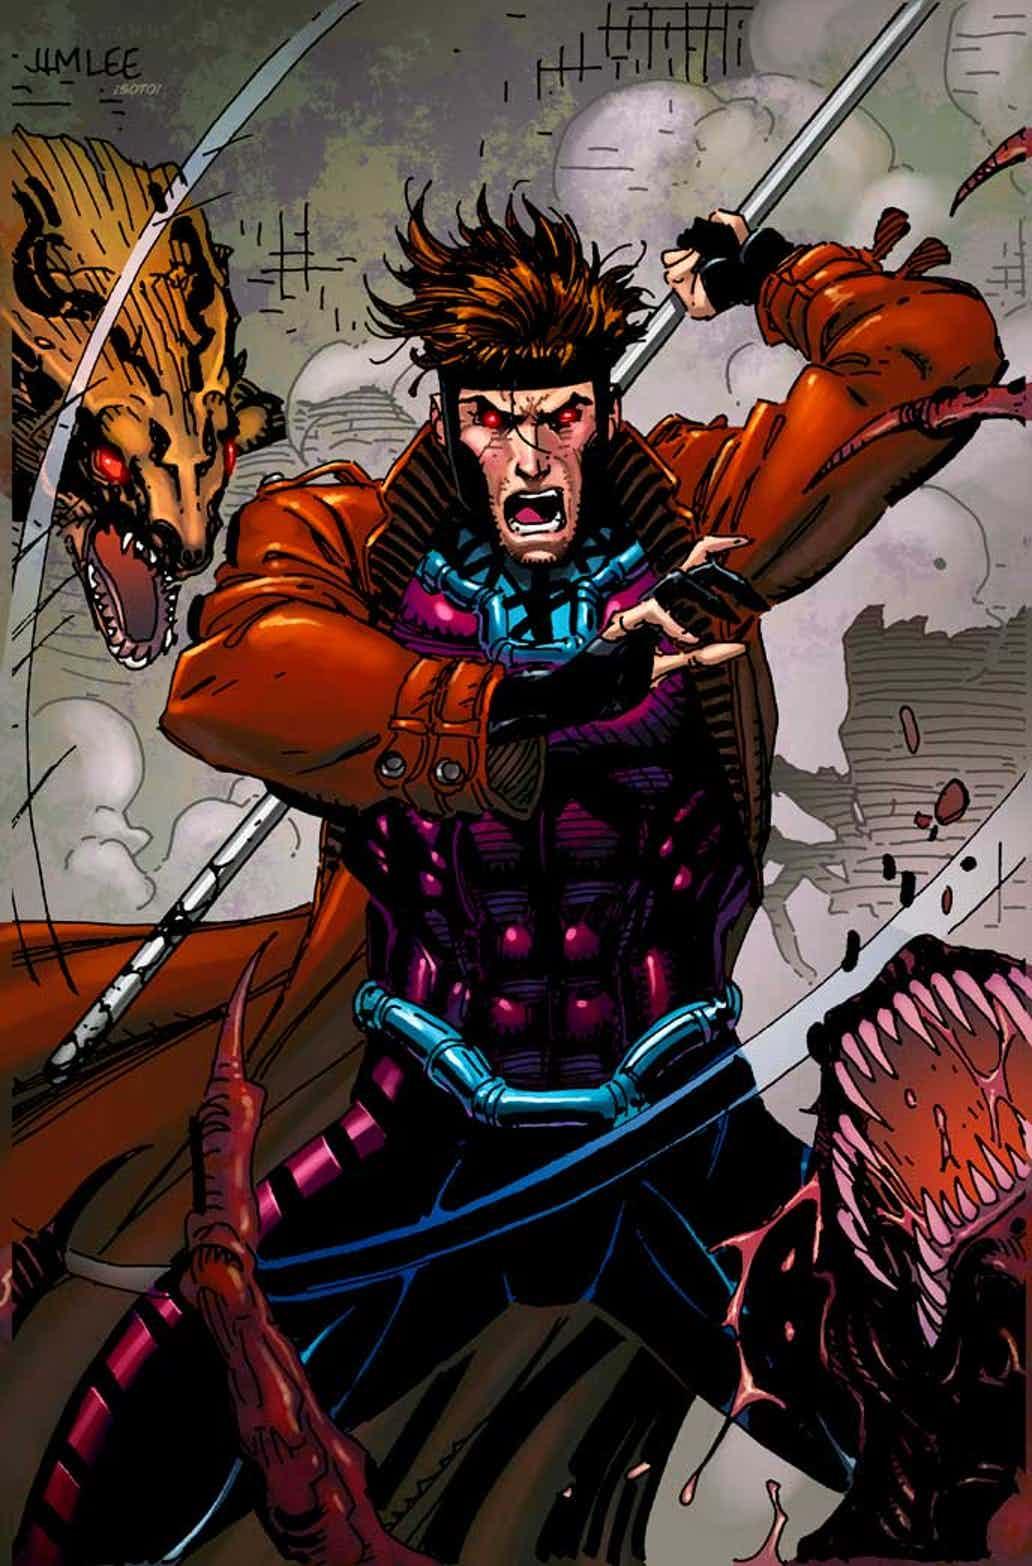 Marvel - 2017 Captain America Steve Rogers #19 Cover A Regular Jesus Saiz